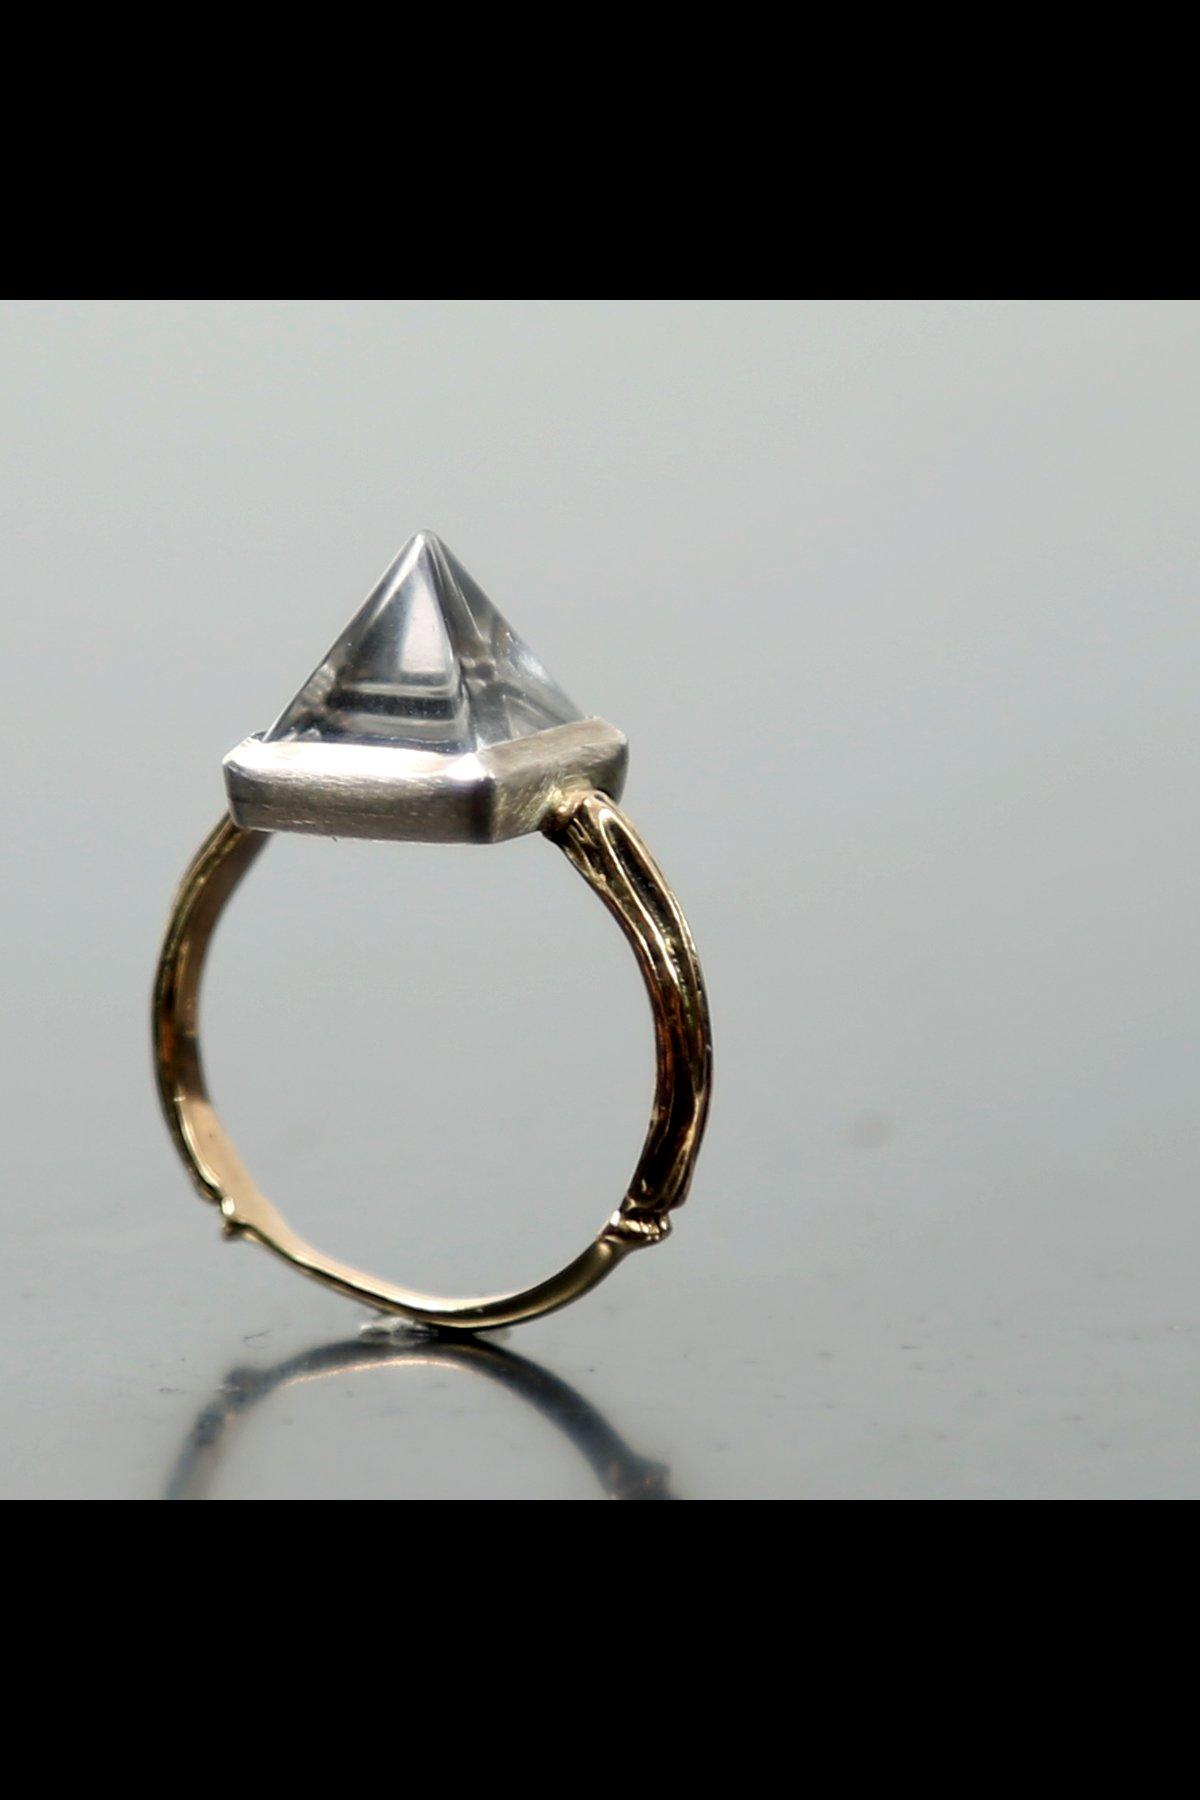 Pyramid Ring N.8S-OCPR-L